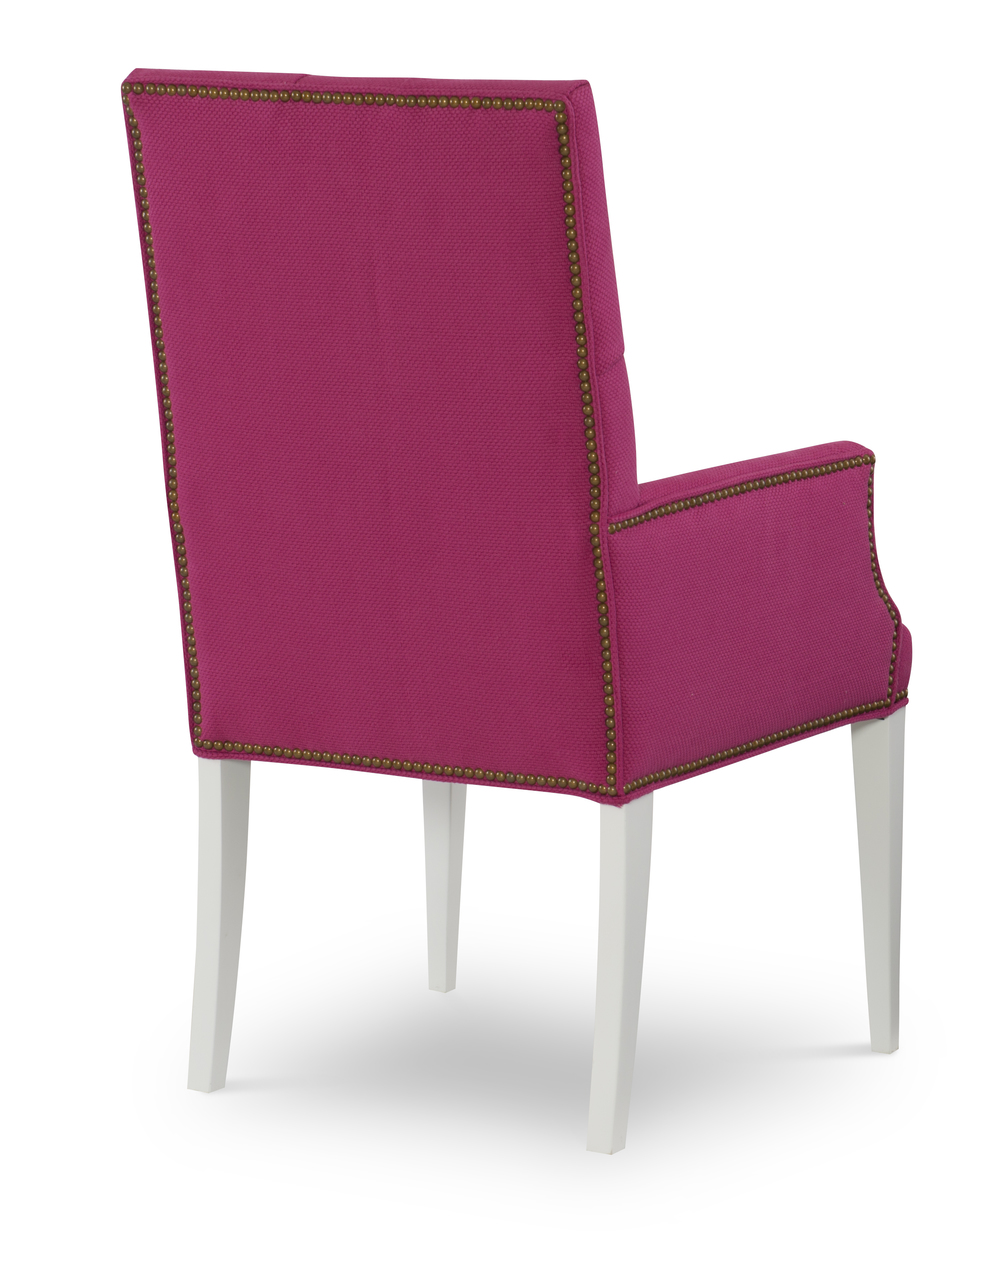 Century Furniture - Fairmont Tufted Arm Chair